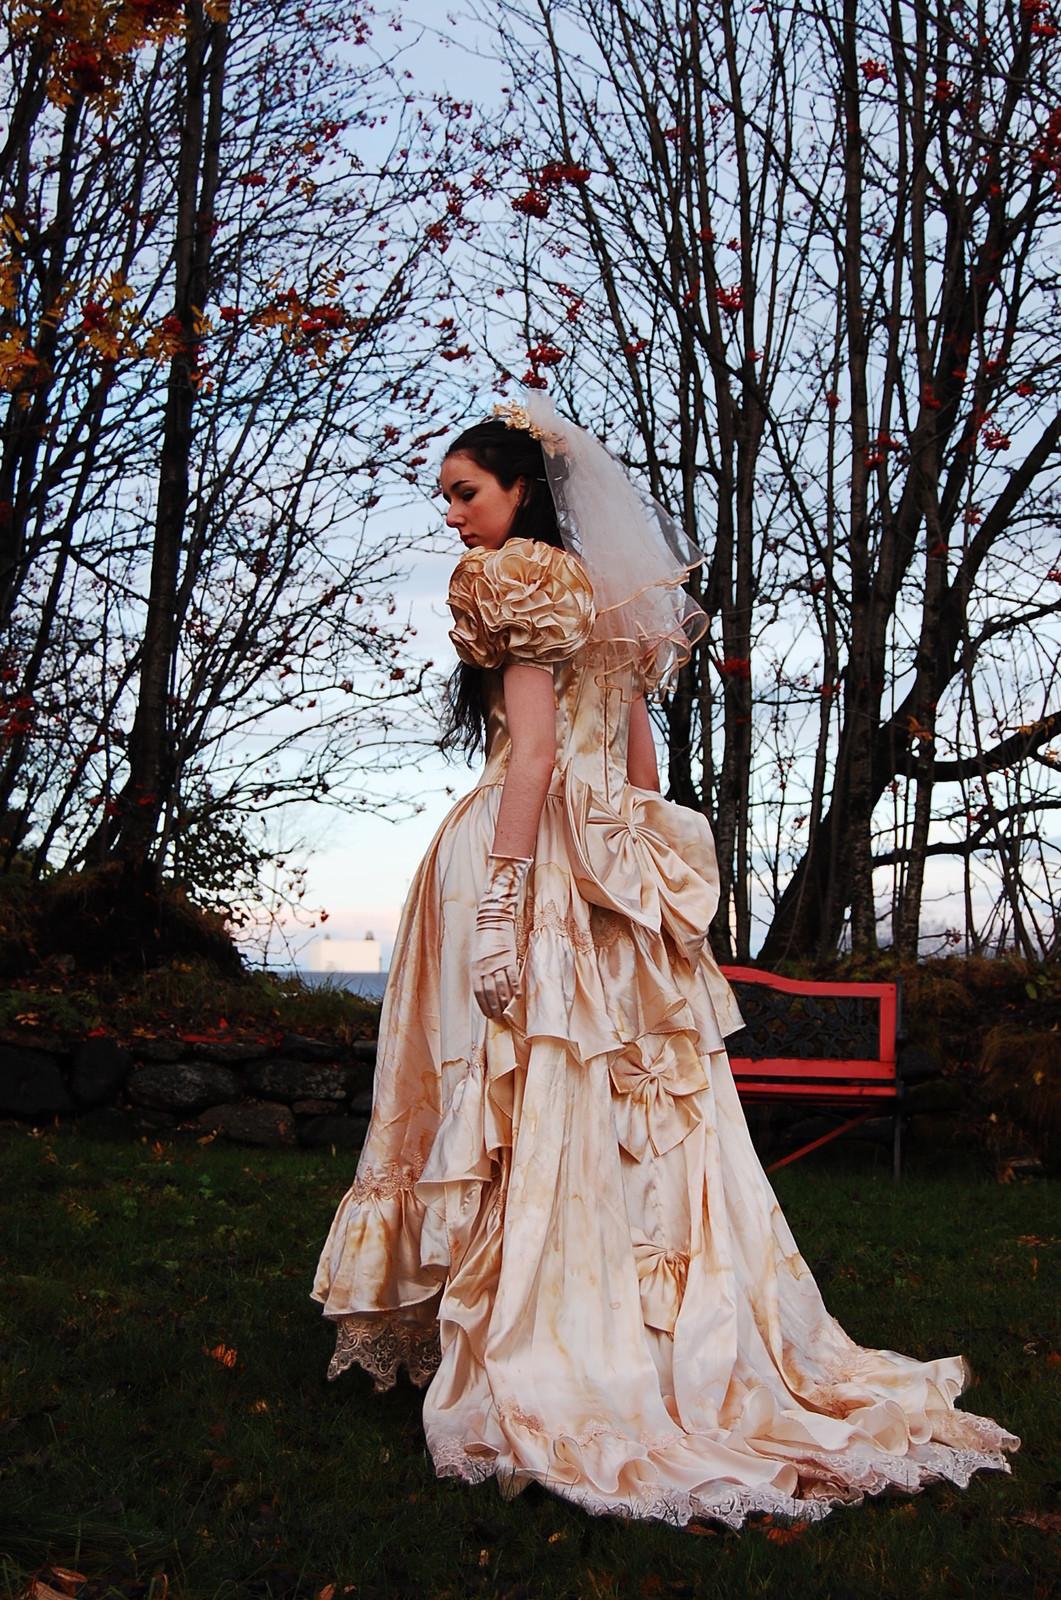 Vampire Bride Tanz Der Vampire 183 A Full Costume